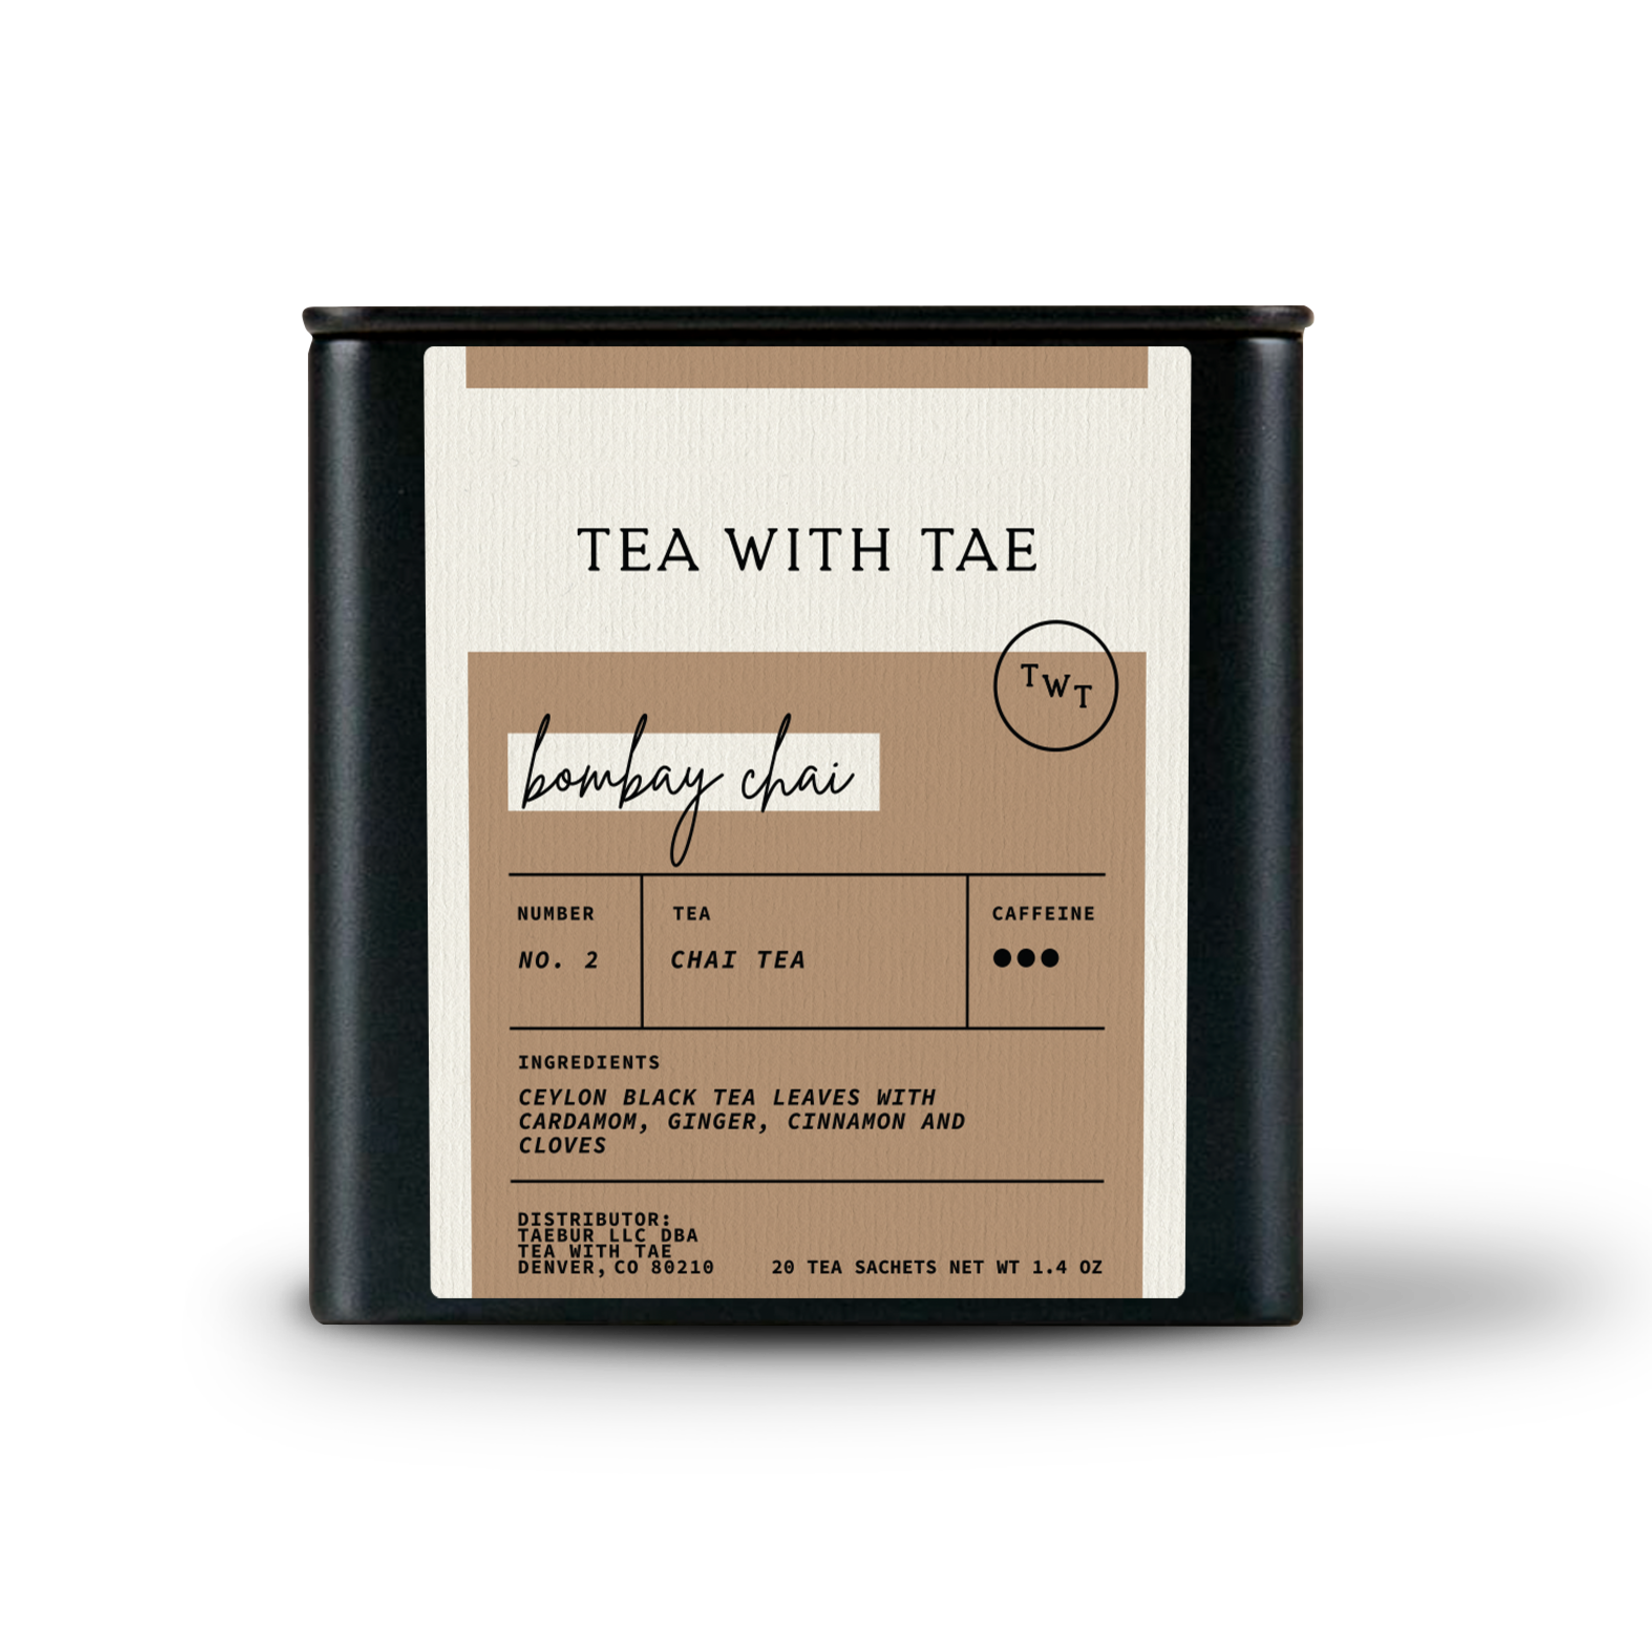 Tea with Tae Tea with Tae Bombay Chai Large Tea Tin